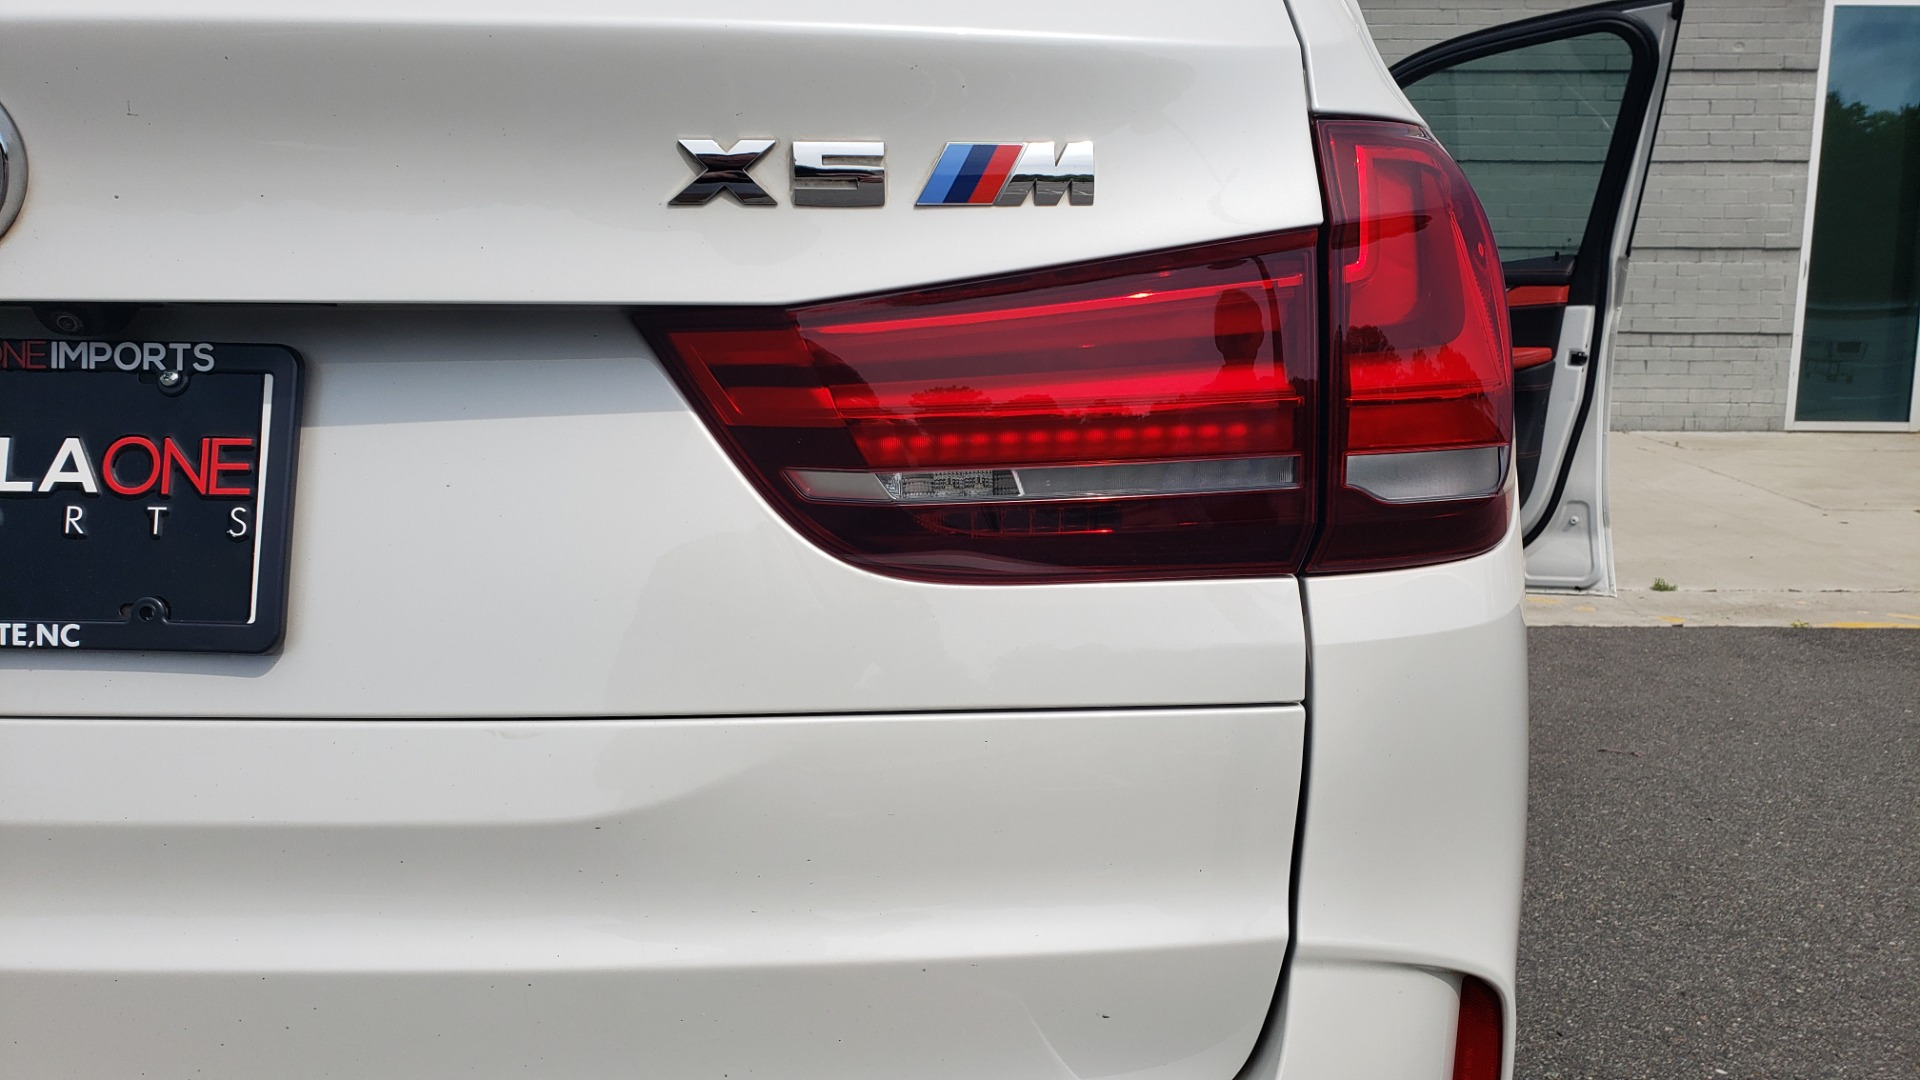 Used 2017 BMW X5 M EXECUTIVE PKG / NAV / DRVR ASST / BSM / HUD / HTD STS / WIFI for sale Sold at Formula Imports in Charlotte NC 28227 30